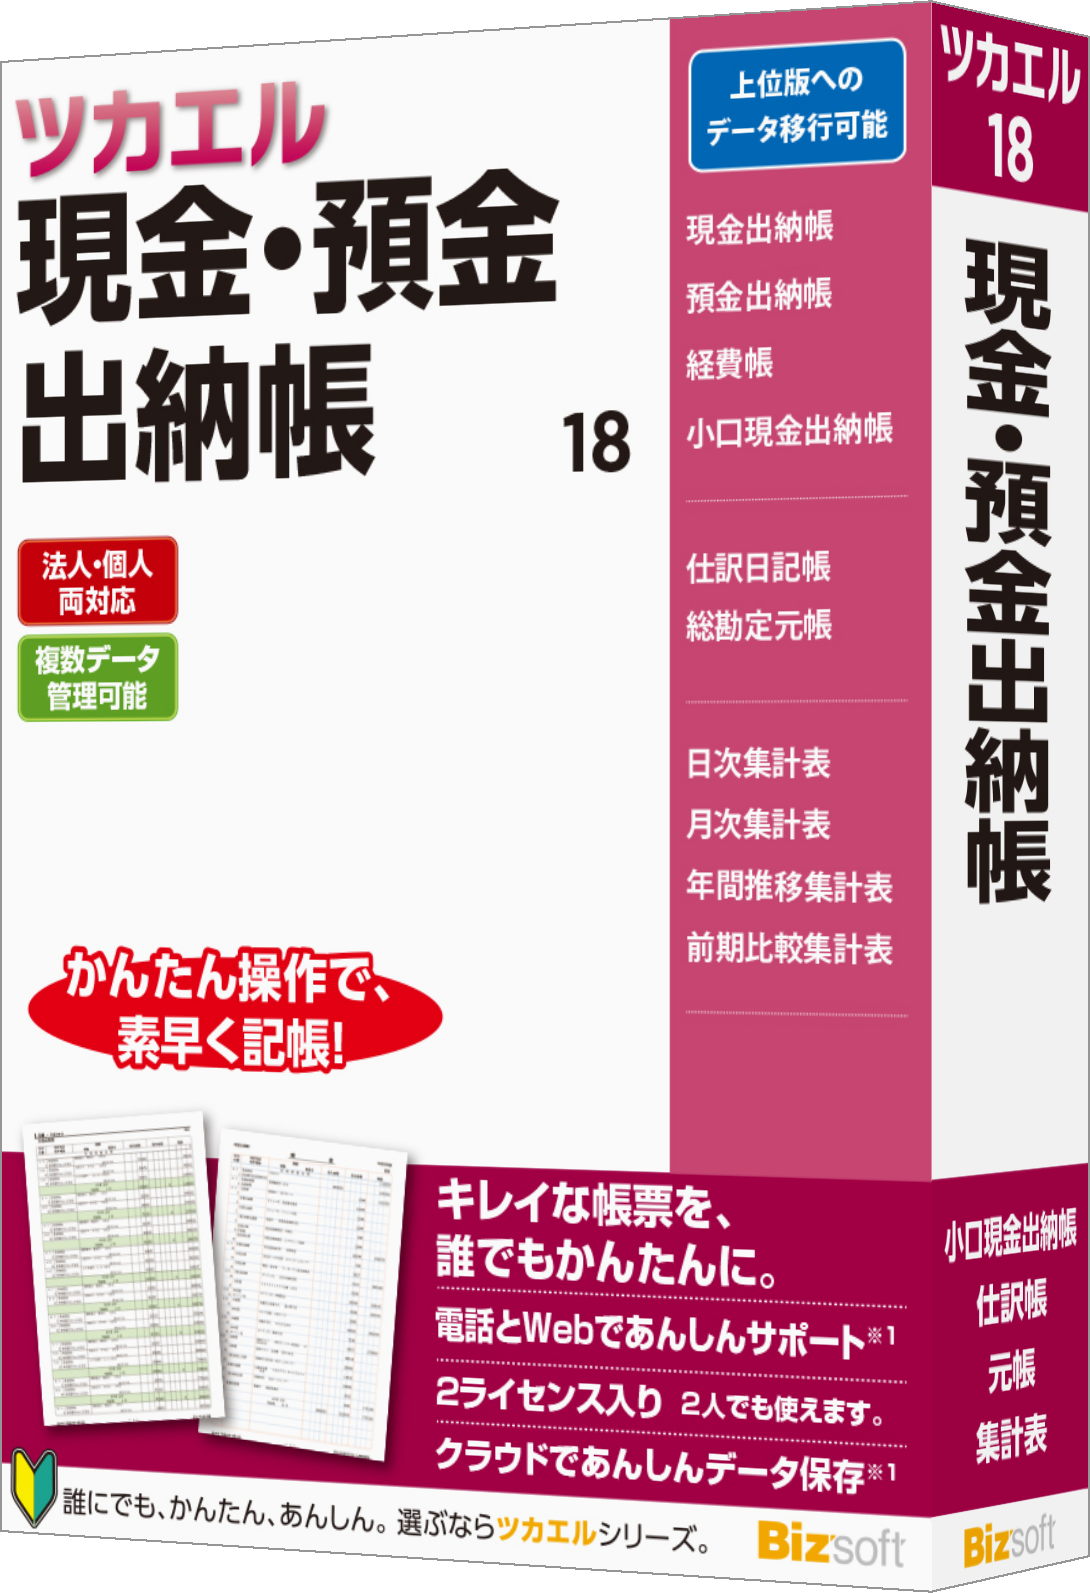 "「<a href=""https://www.bizsoft.co.jp/products/accbook/index.html"">ツカエル現金・預金出納帳 18</a>」パッケージ"